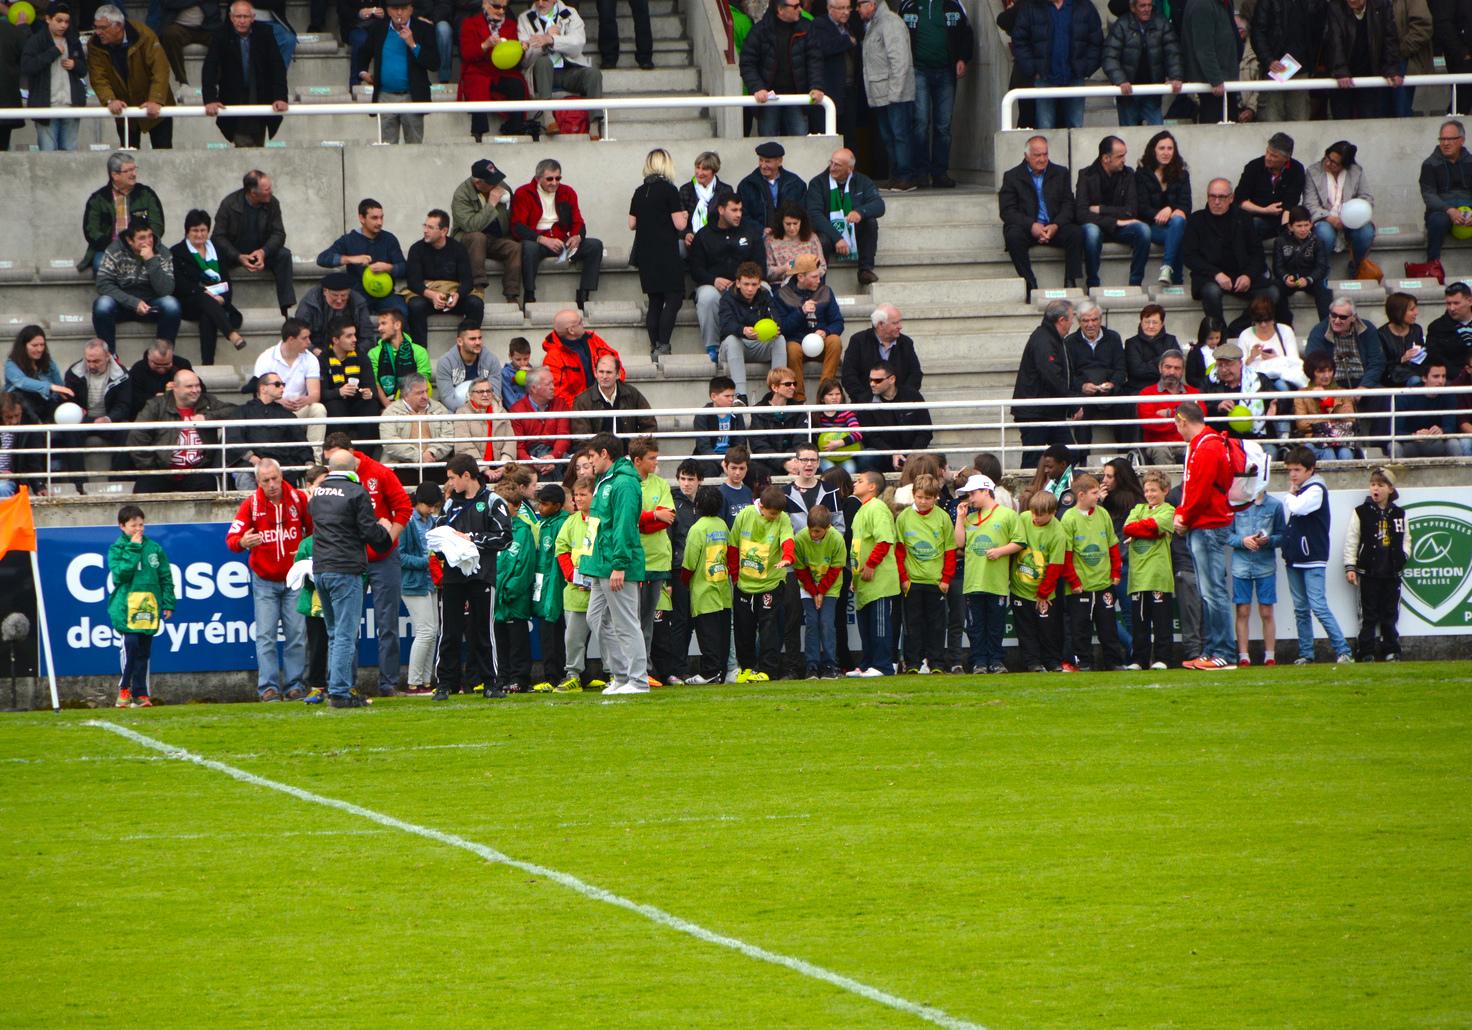 Tiger-Tour-2015-groupe-association-tournoi-rugby-le-cercle-Match-ProD2-agence-evenementielle-pyrenees-34